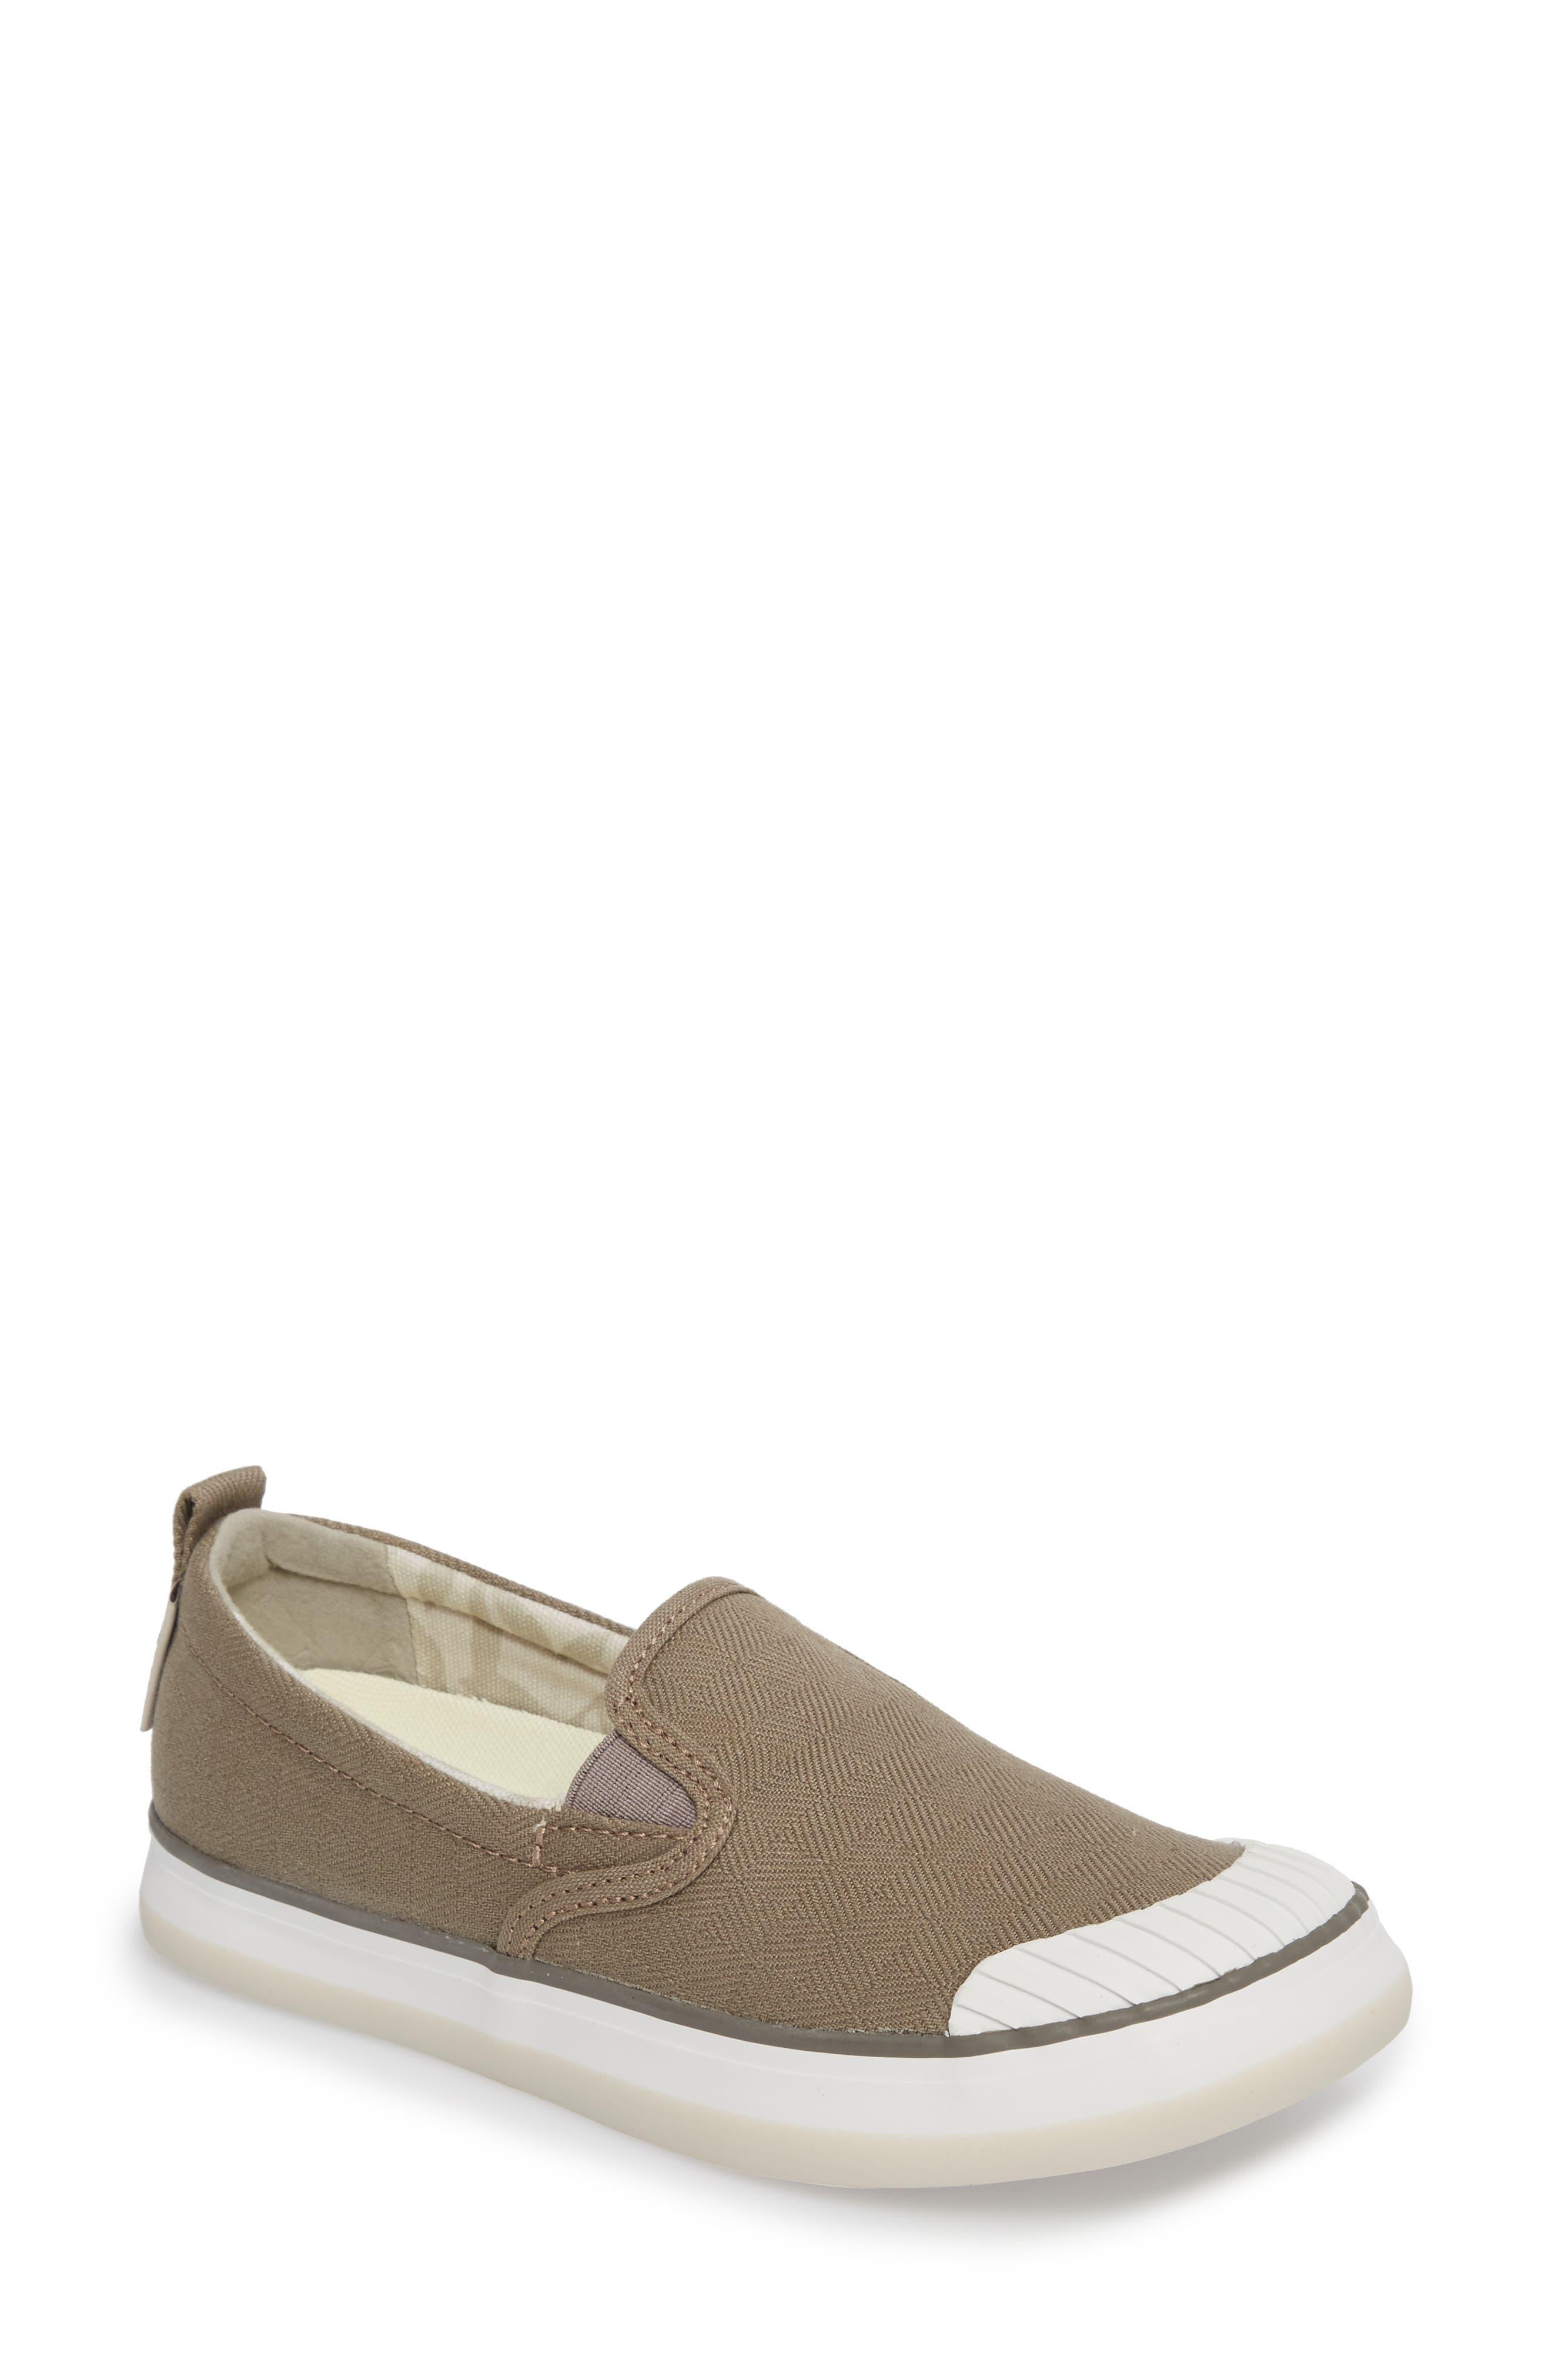 Elsa Slip-On Sneaker,                             Main thumbnail 1, color,                             Brindle